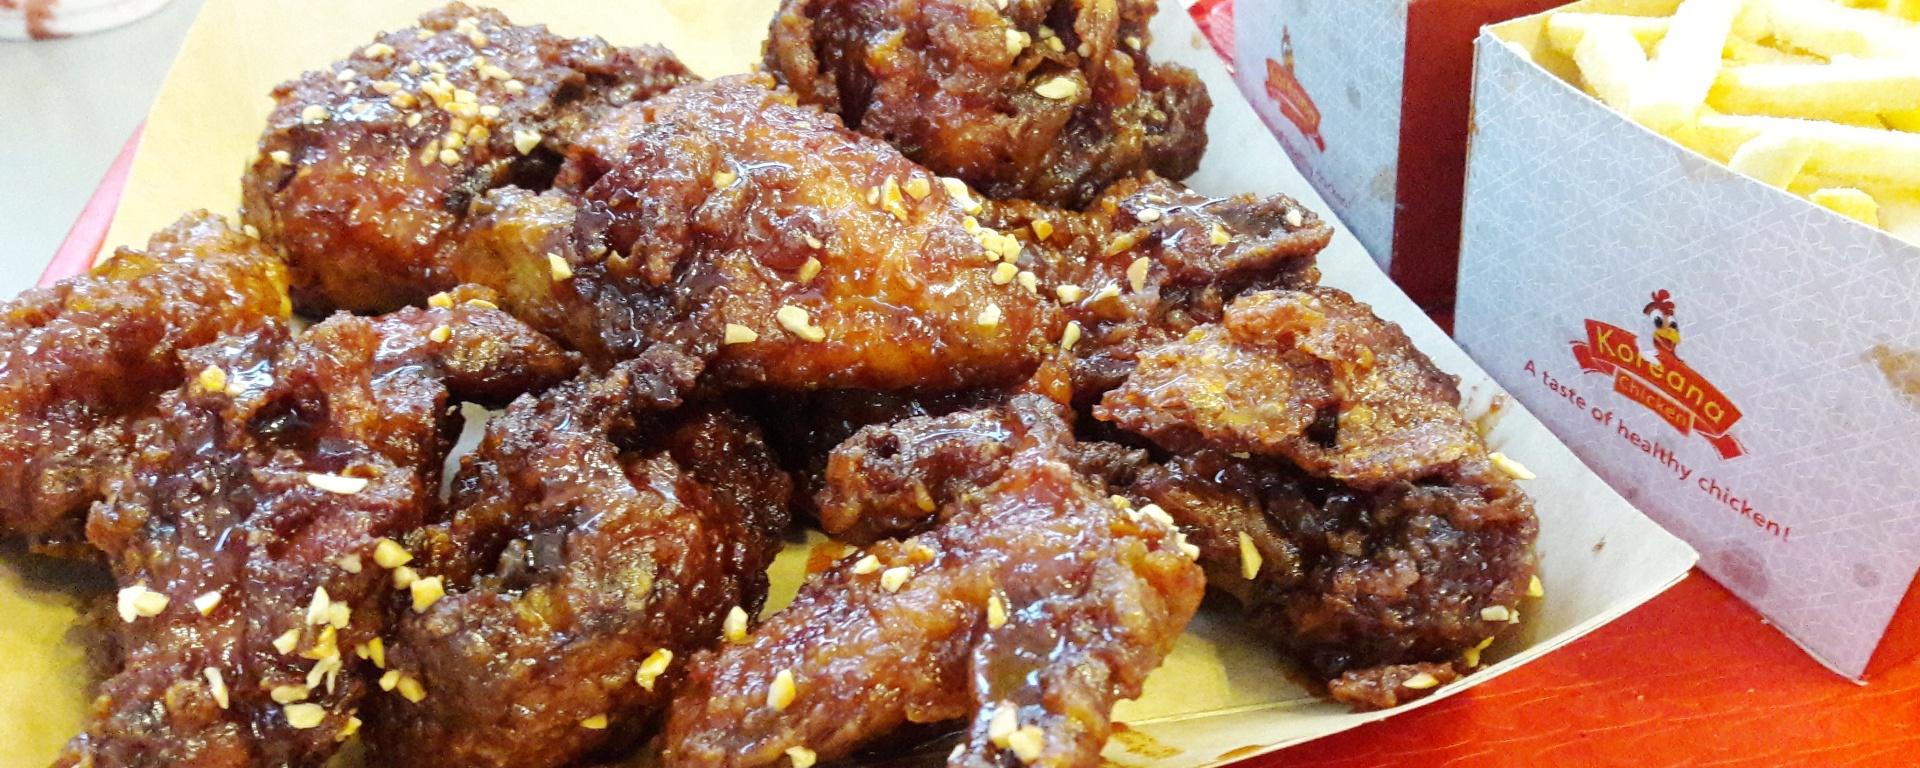 Sweet and Spicy Chicken at Koreana Chicken, Garden City Mall – Tafakari